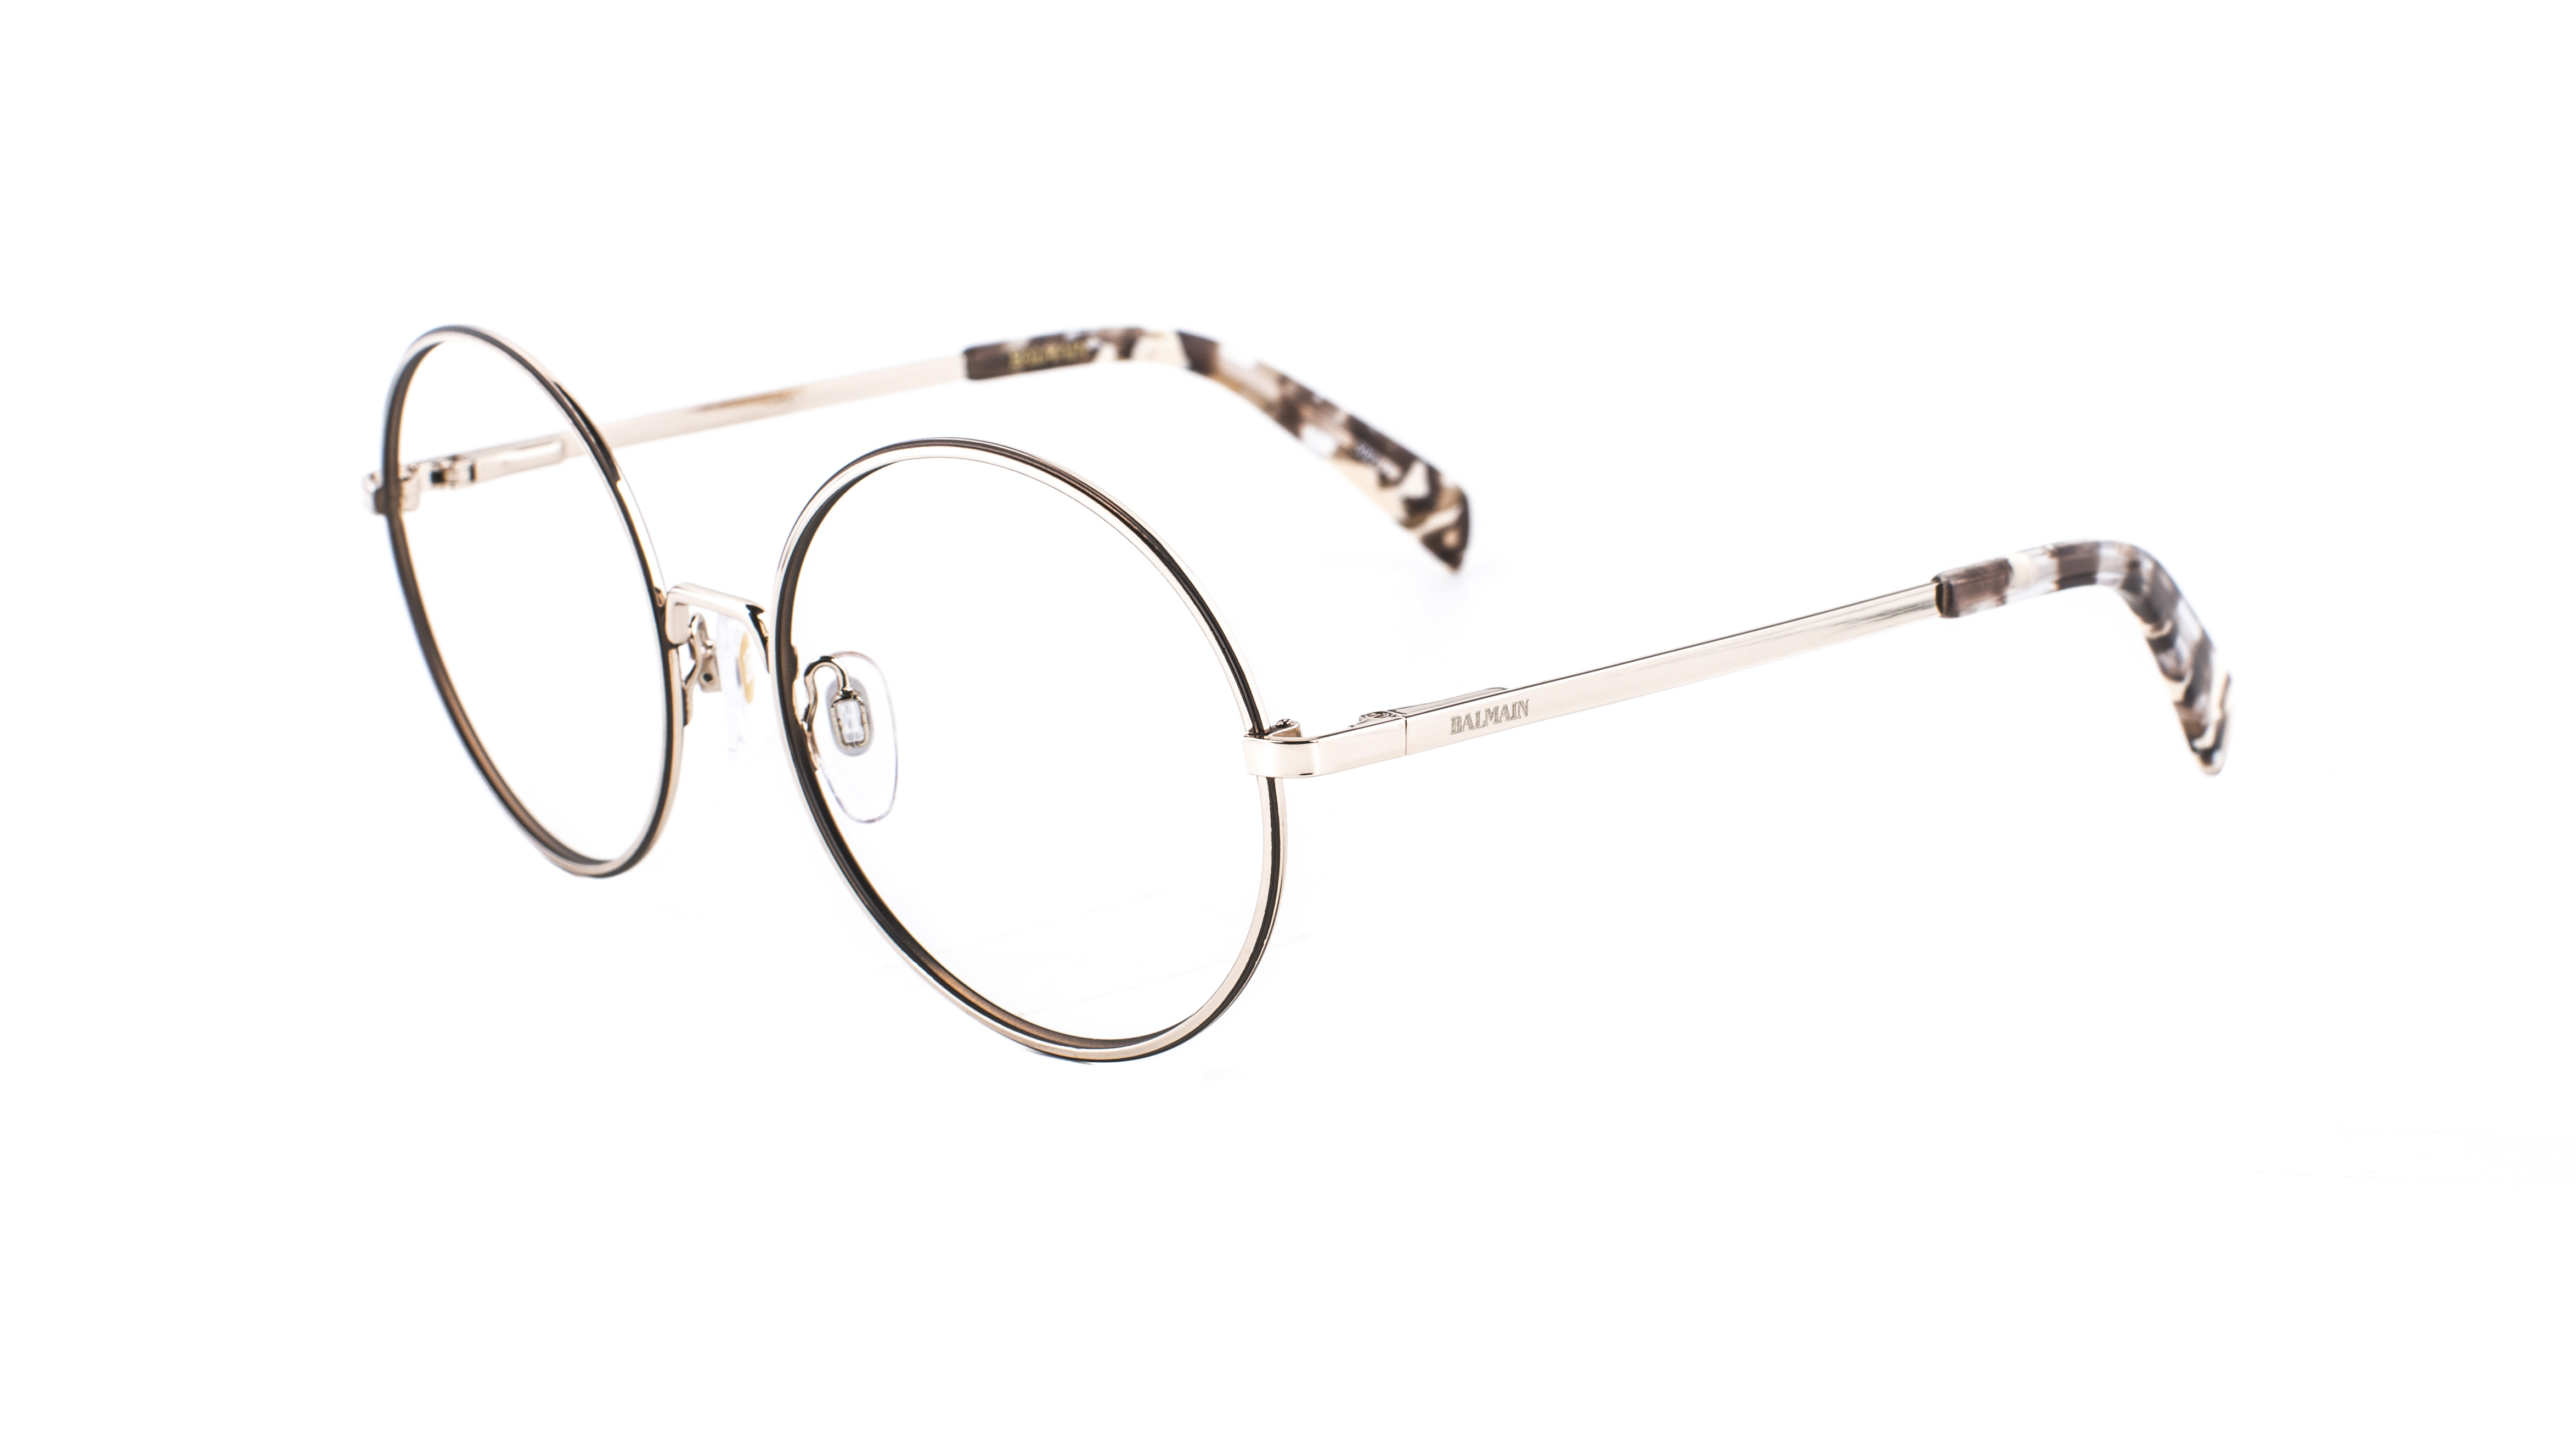 Balmain x Specsavers BL1504S 30570665 - RRP 2 pairs single vision $459